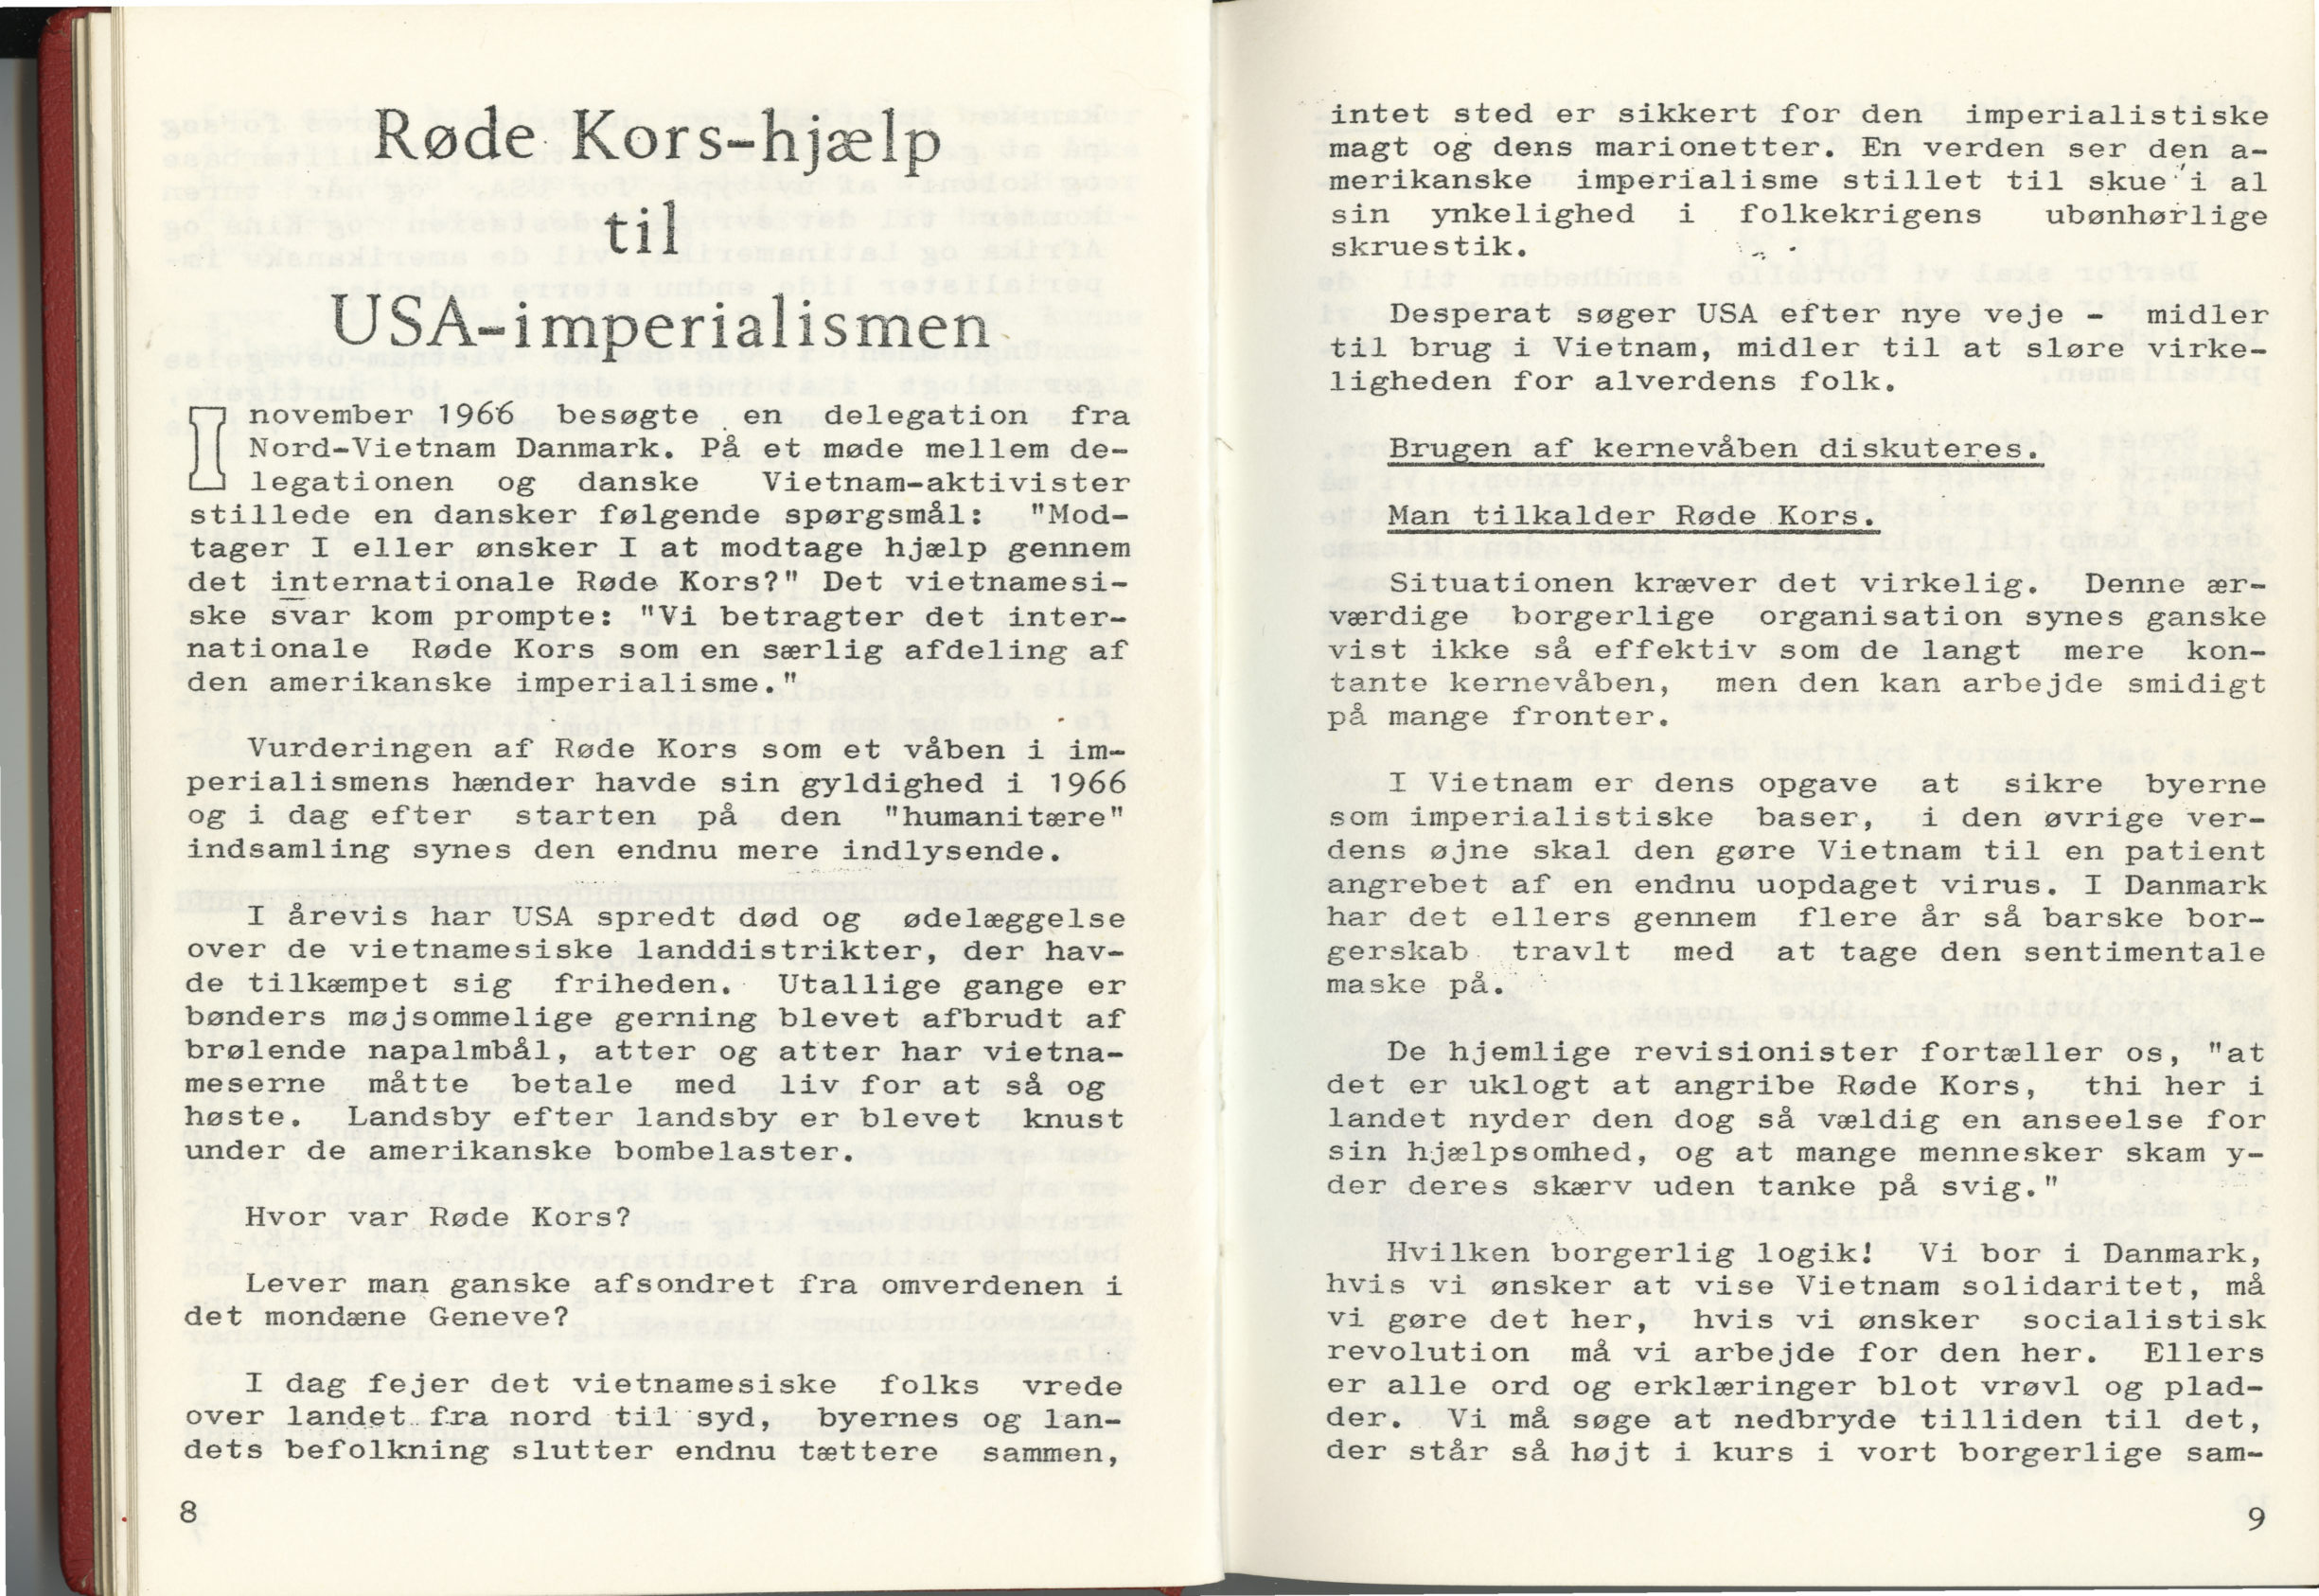 Ungkommunisten, 1968, nr. 3, s. 8-9